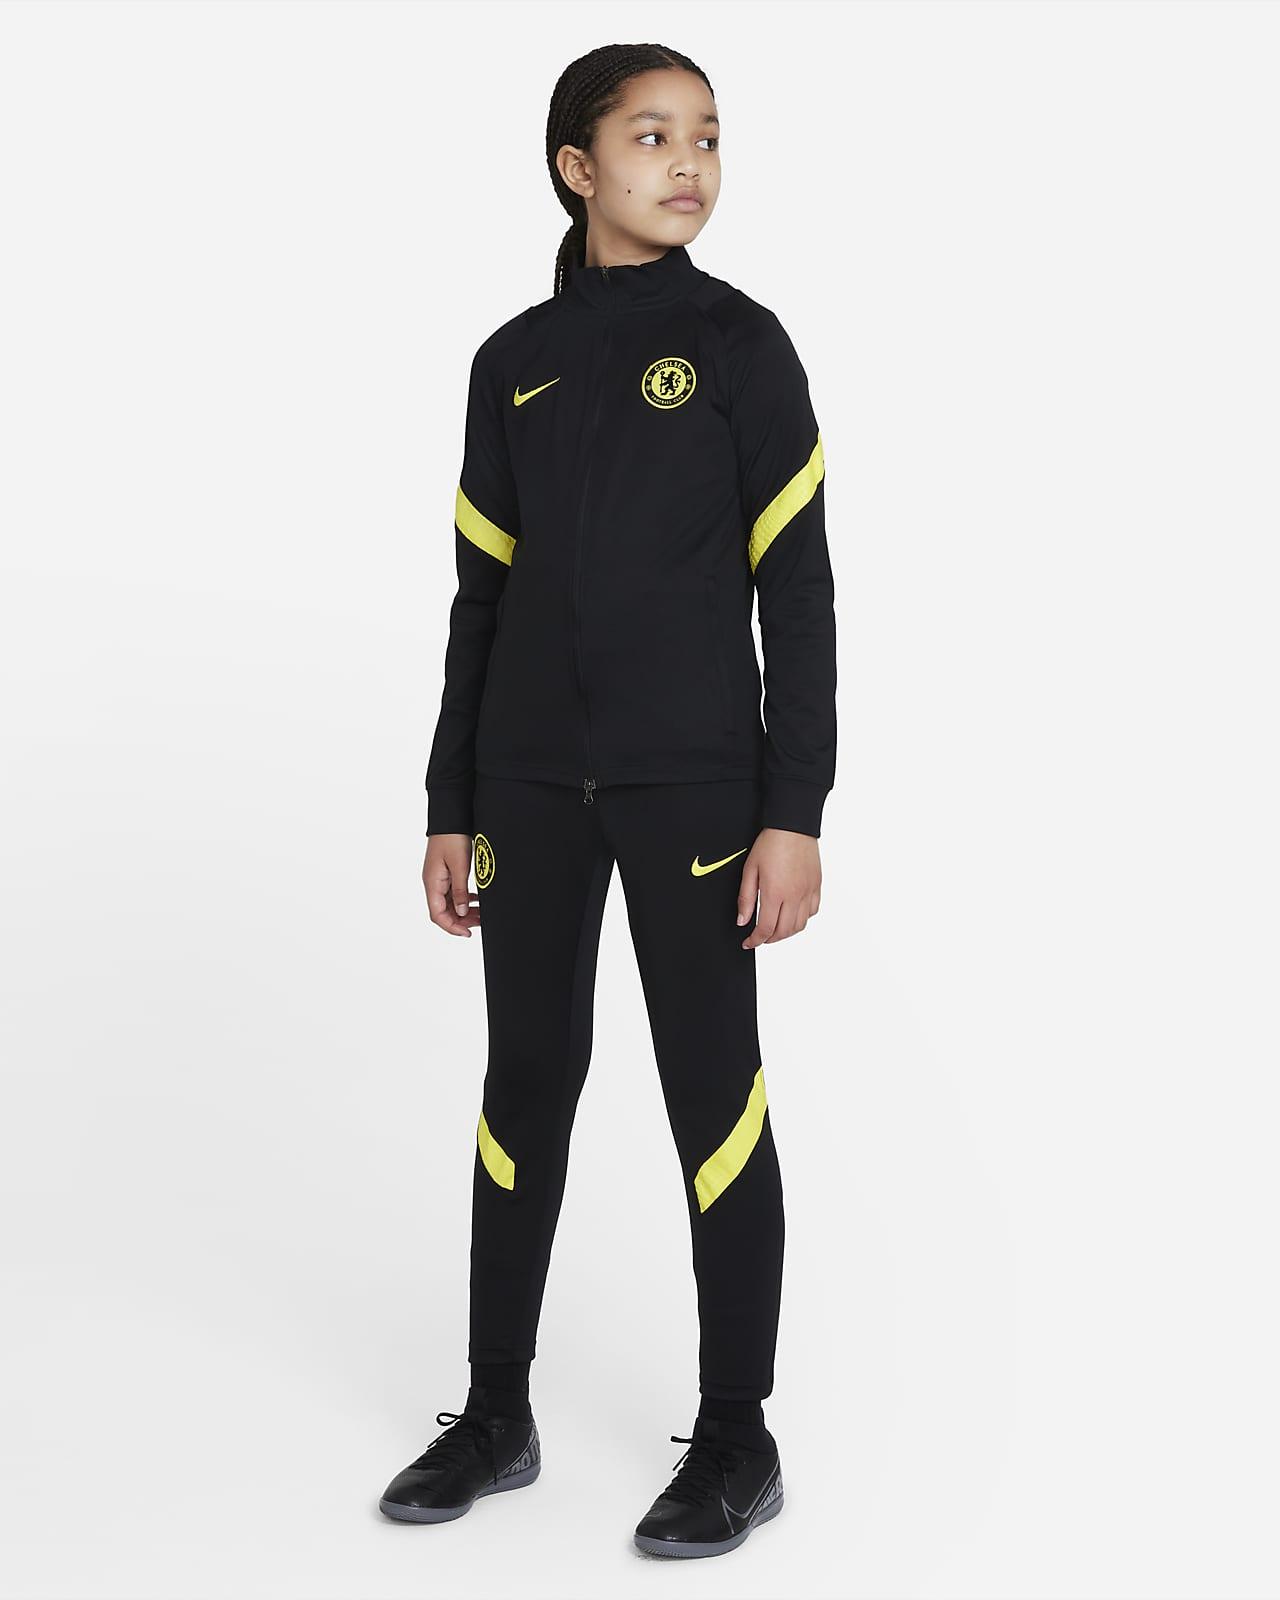 Chelsea FC Strike Nike Dri-FIT Genç Çocuk Futbol Eşofmanı